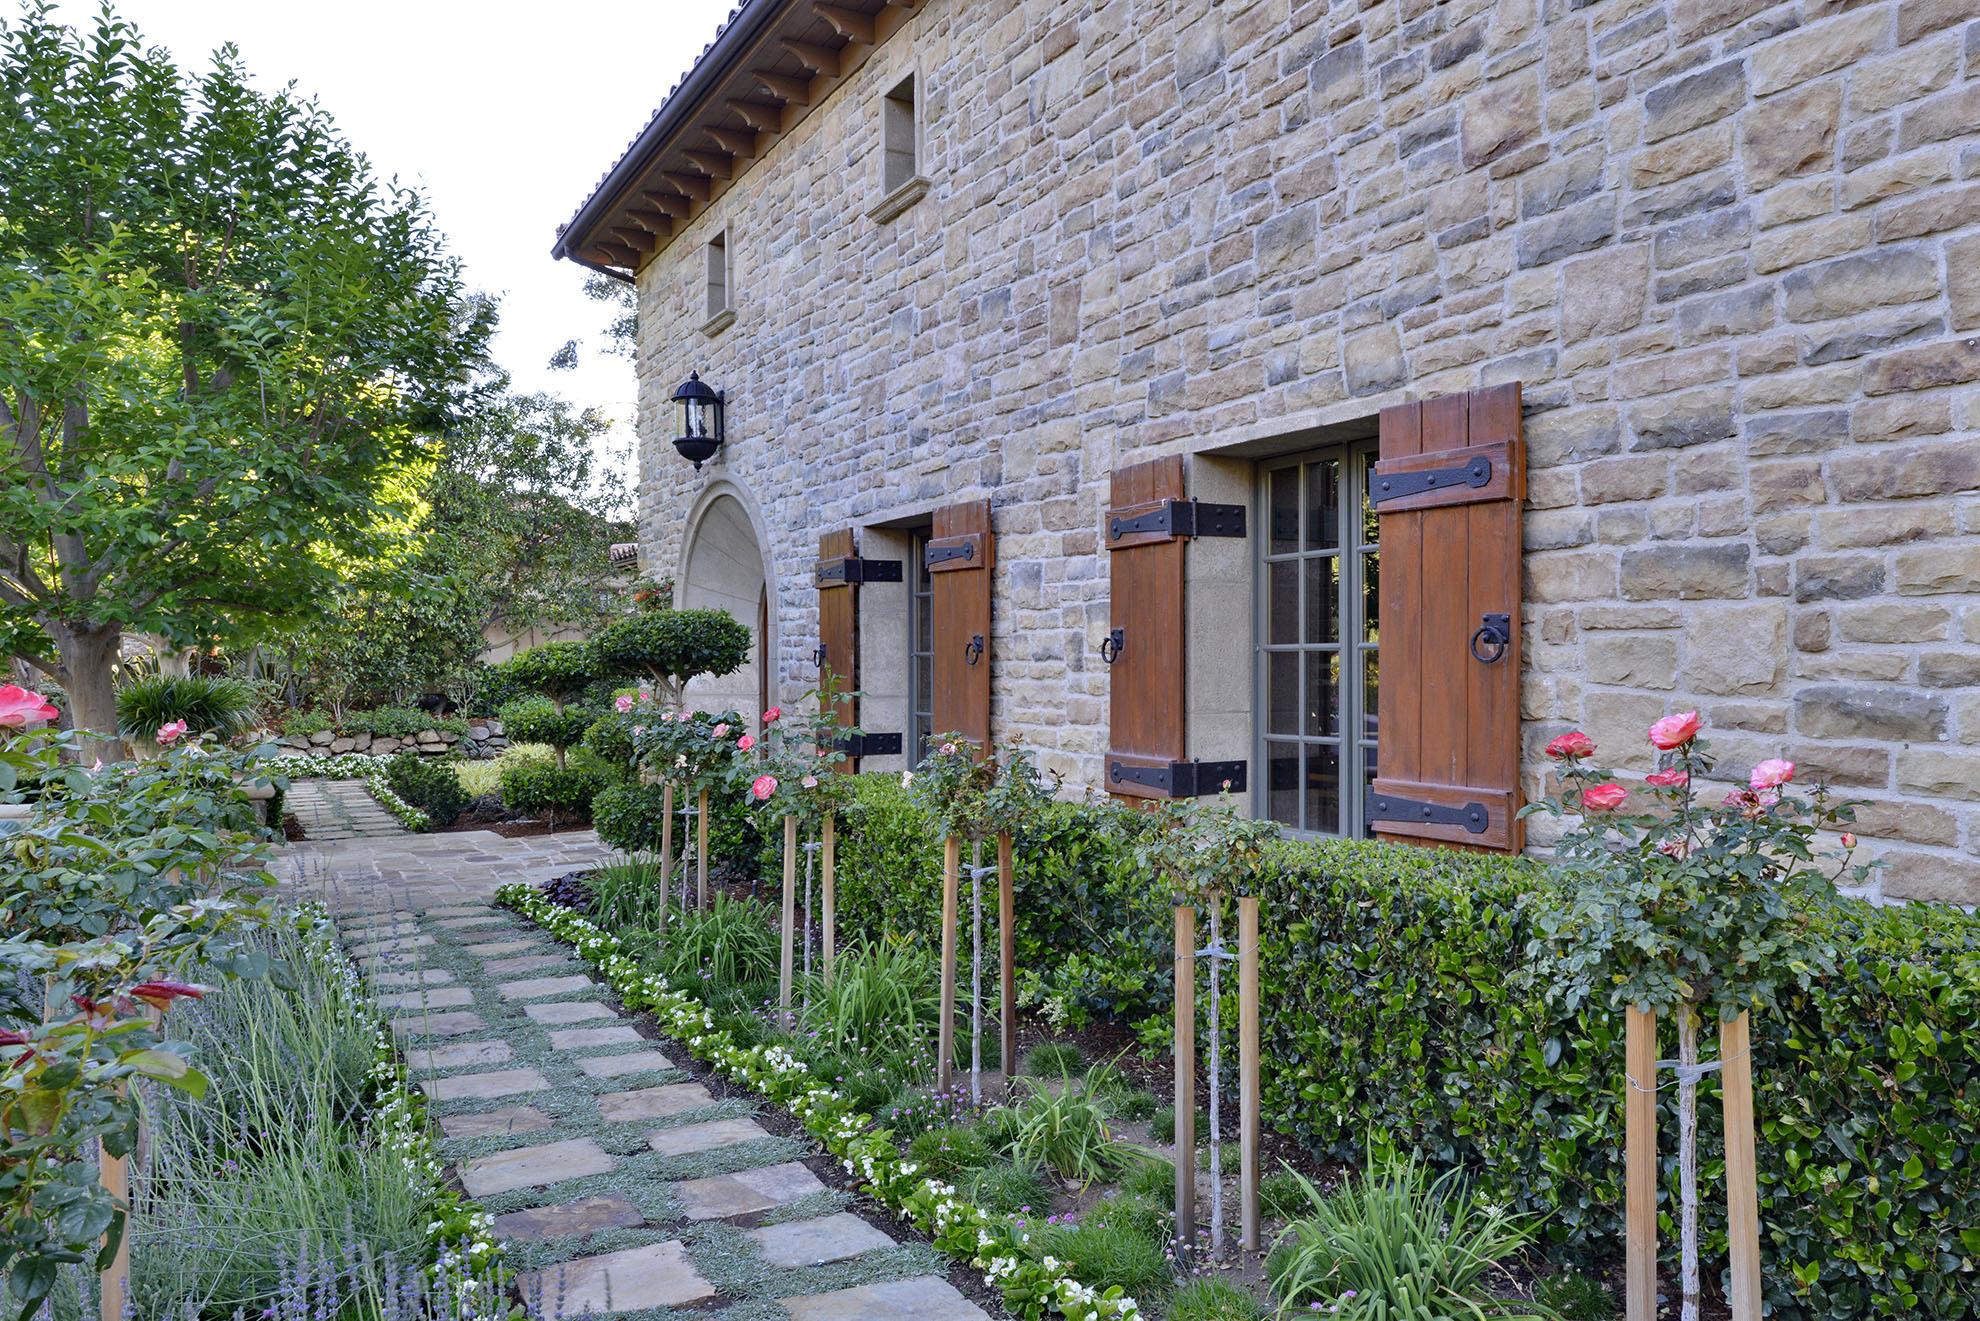 Rancho Santa Fe Mediterranean Gardens Torrey Pines Landscape Company San Diego Landscape Design Build Maintenance